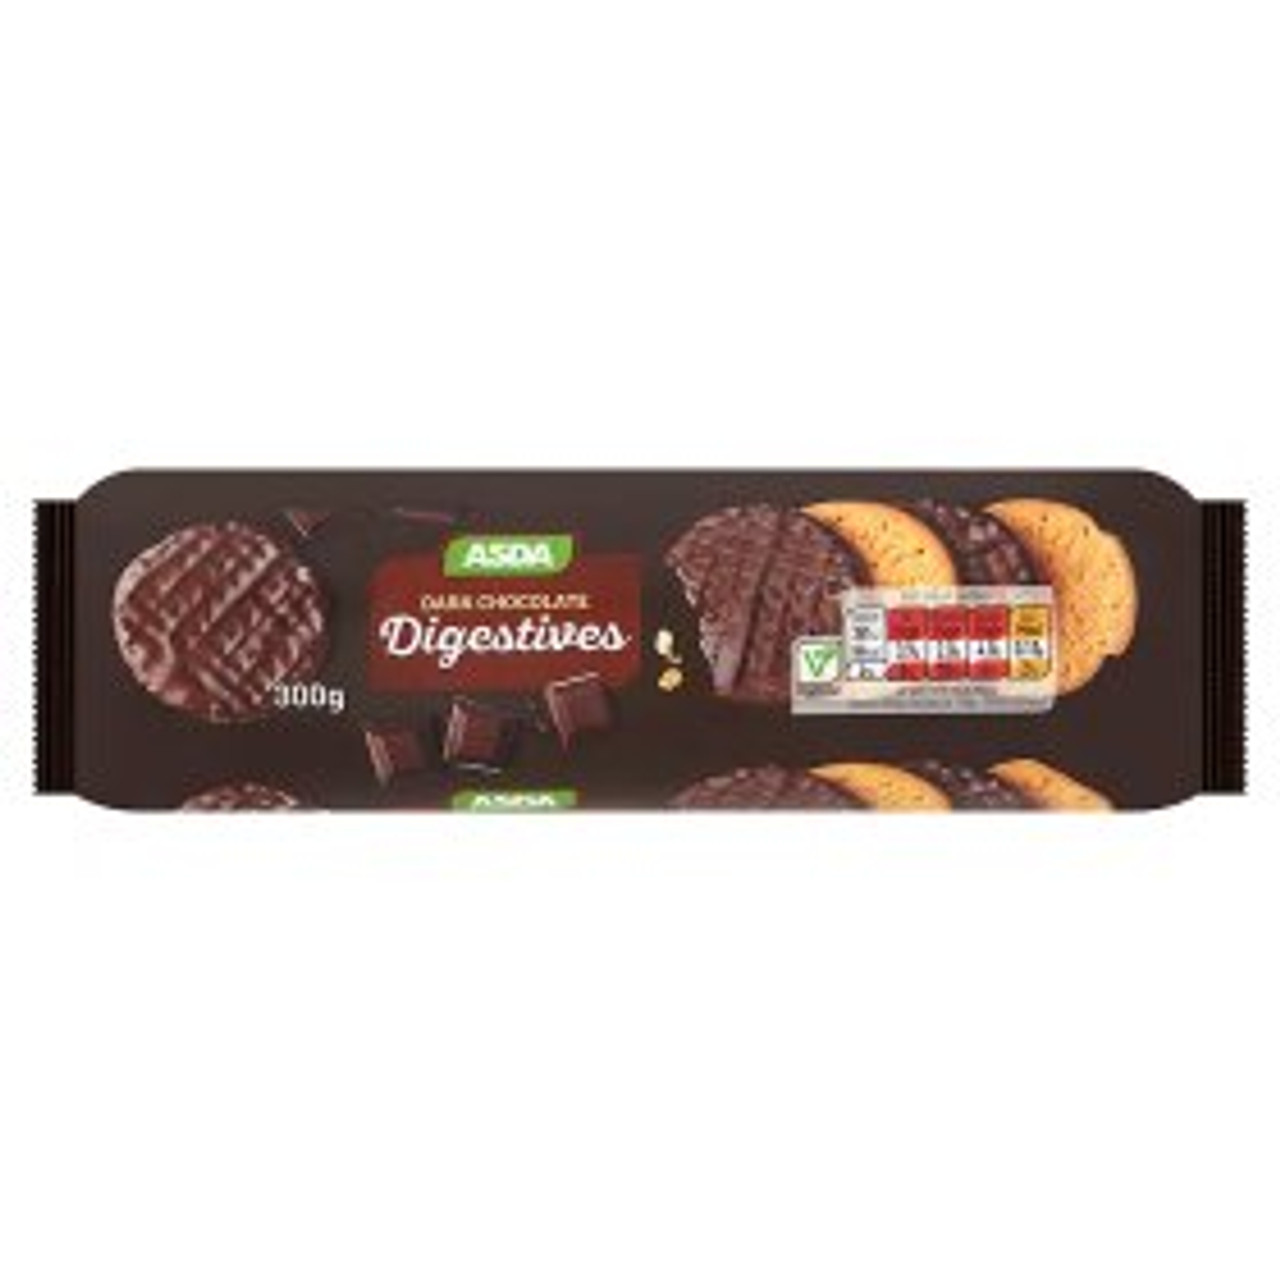 Asda Dark Chocolate Digestives 300g